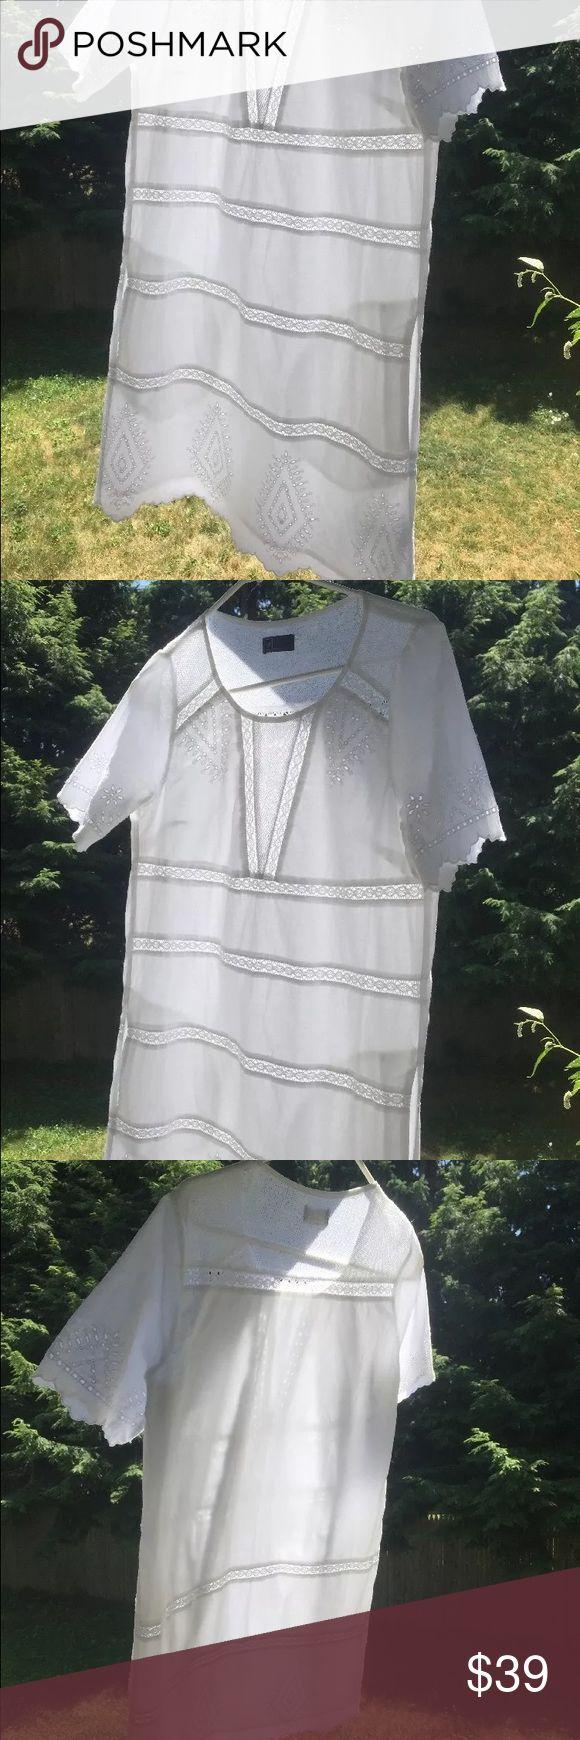 Selling this GAP White eyelet short sleeve dress with pockets on Poshmark! My username is: spenway. #shopmycloset #poshmark #fashion #shopping #style #forsale #GAP #Dresses & Skirts